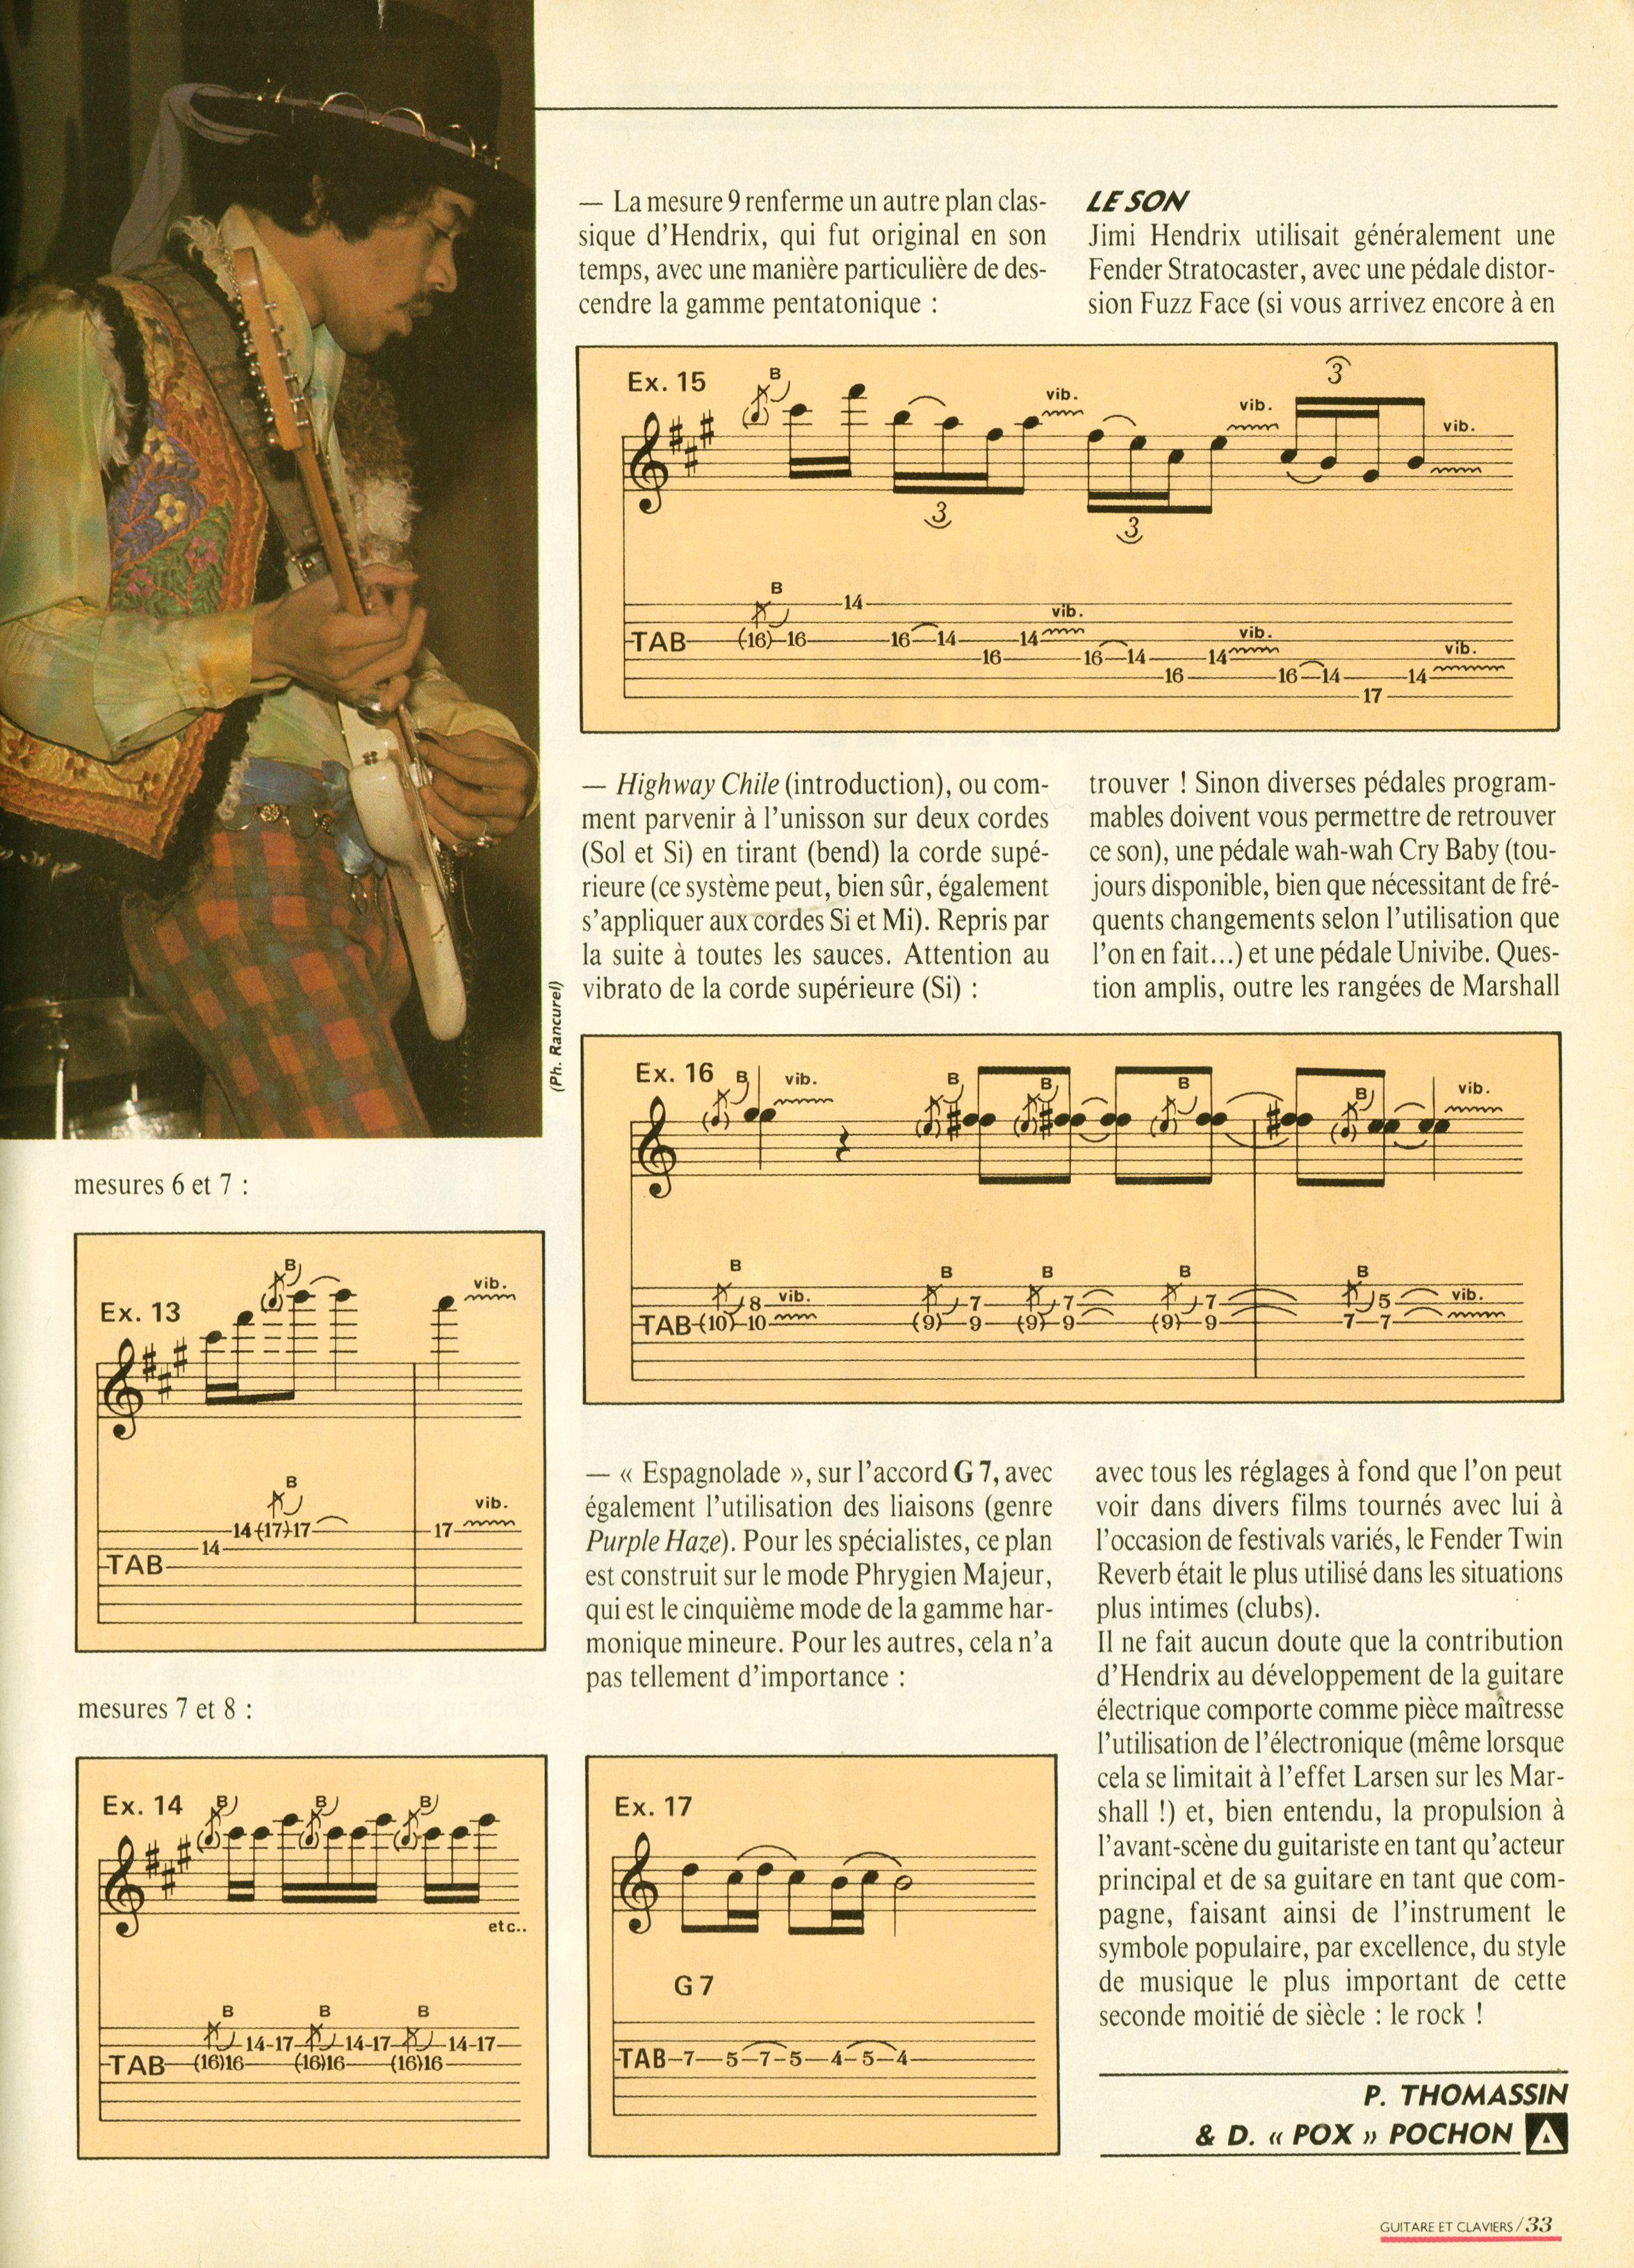 Magazines Français 1989 - 2014 GuitareClaviersMars1989Page33